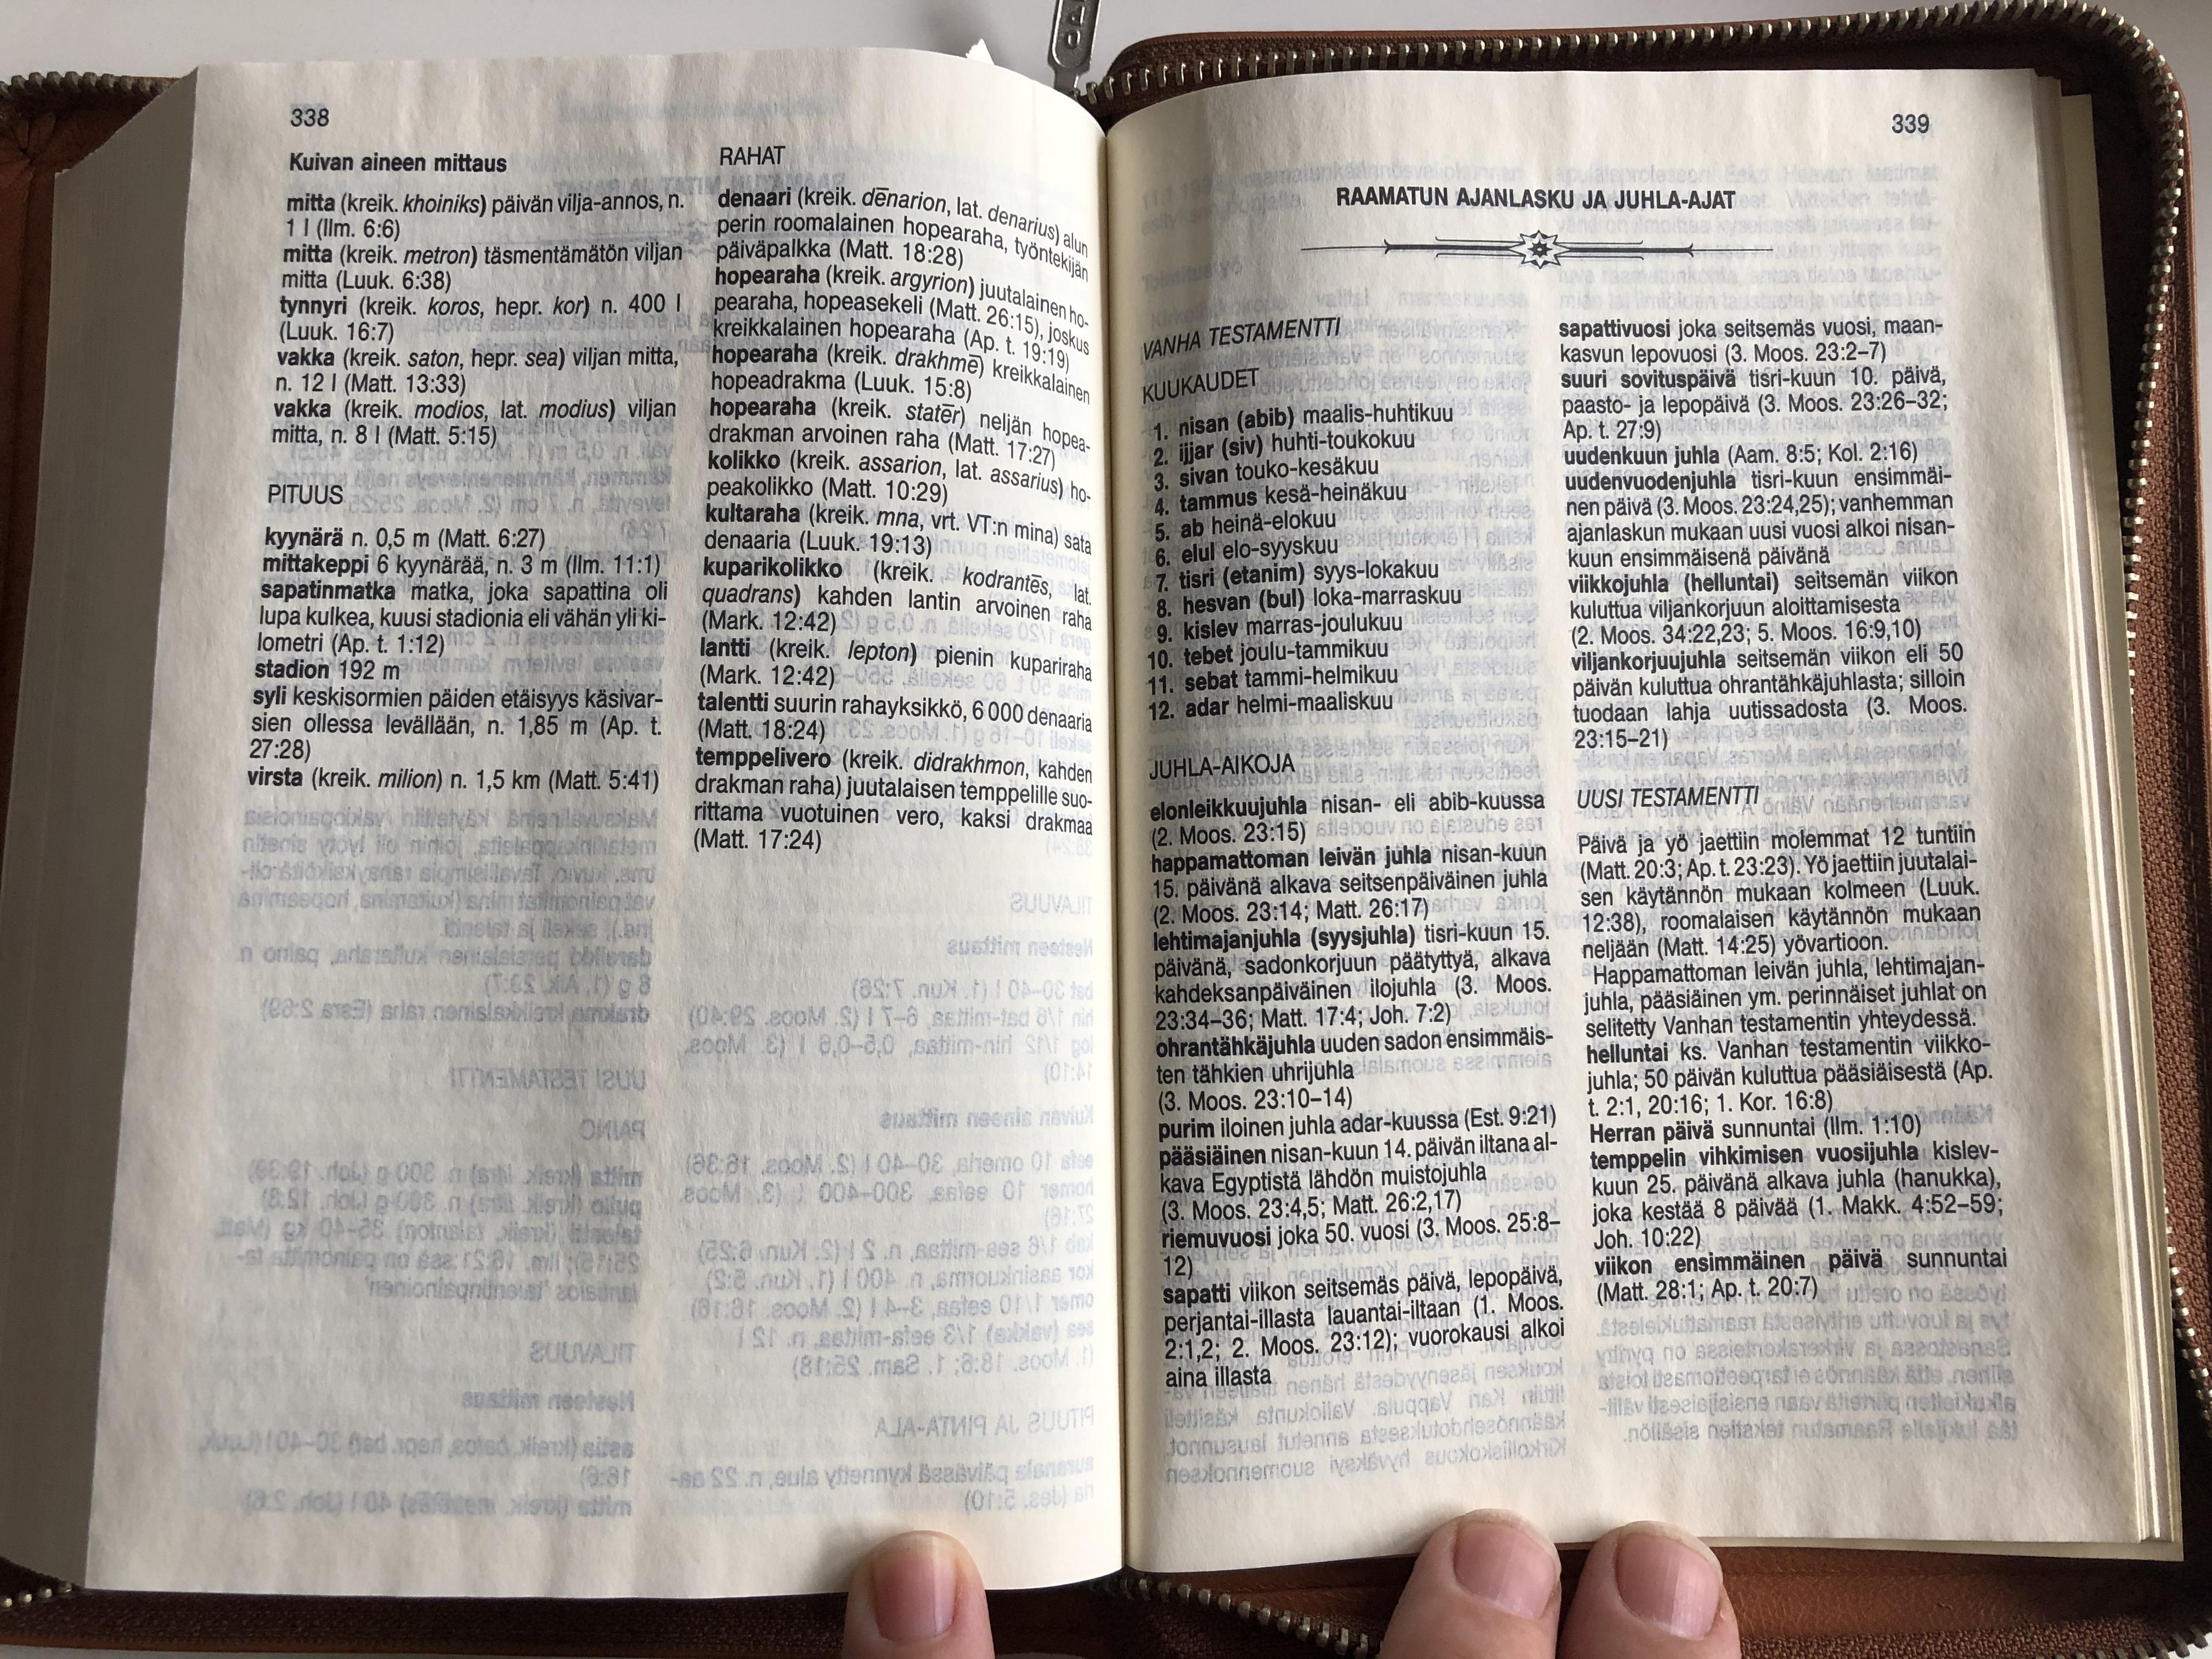 pyh-raamattu-finnish-language-brown-leather-bound-bible-17.jpg